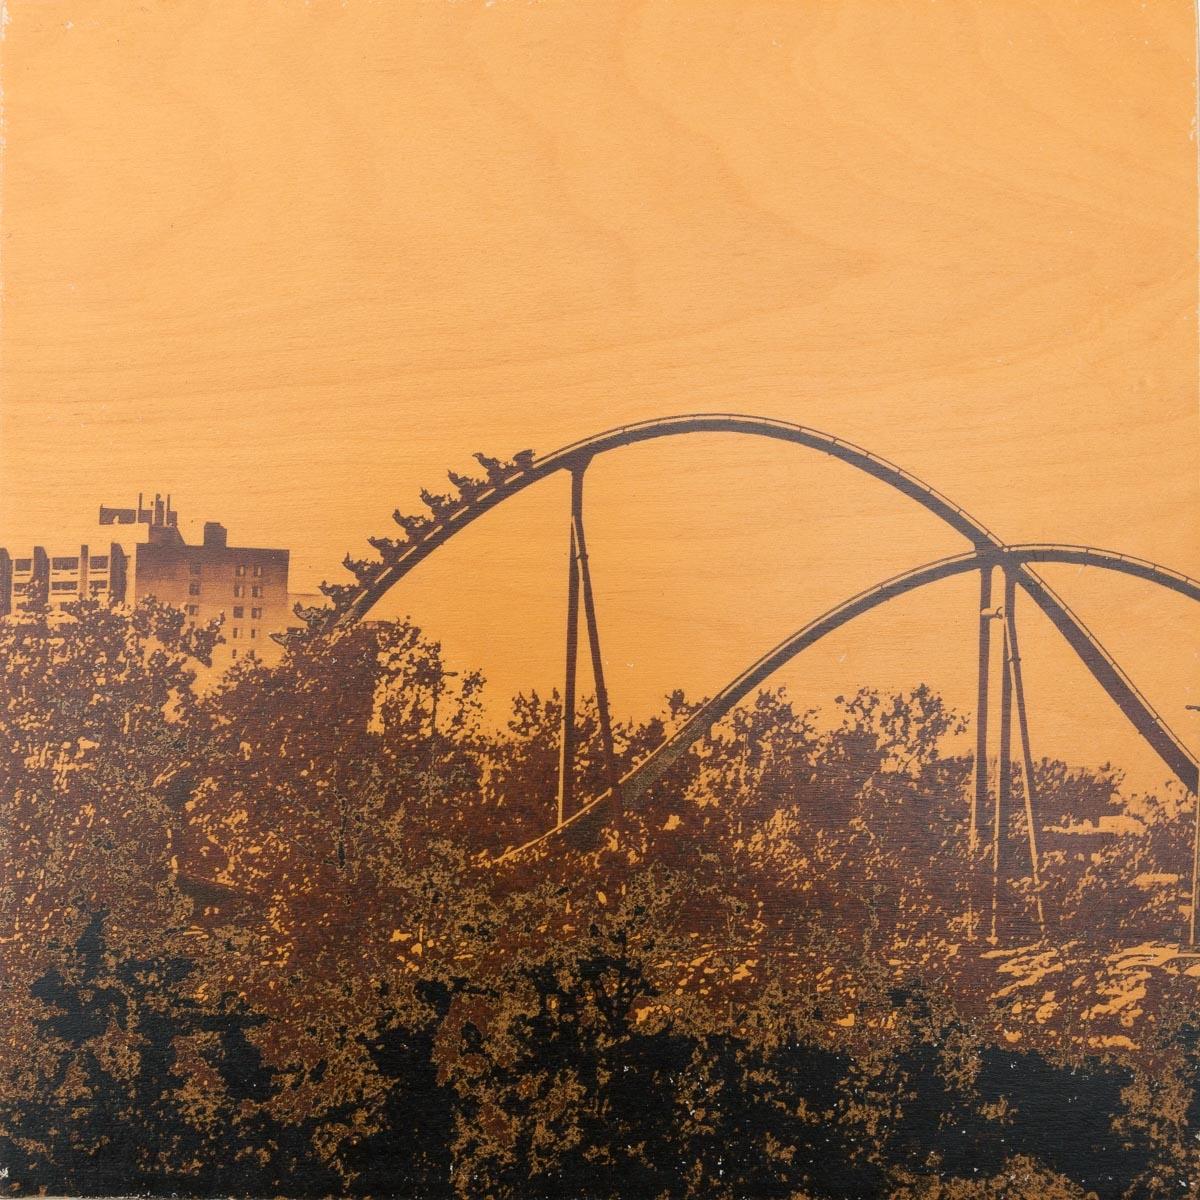 Joy Ride Orange #8 by Patrick Lajoie